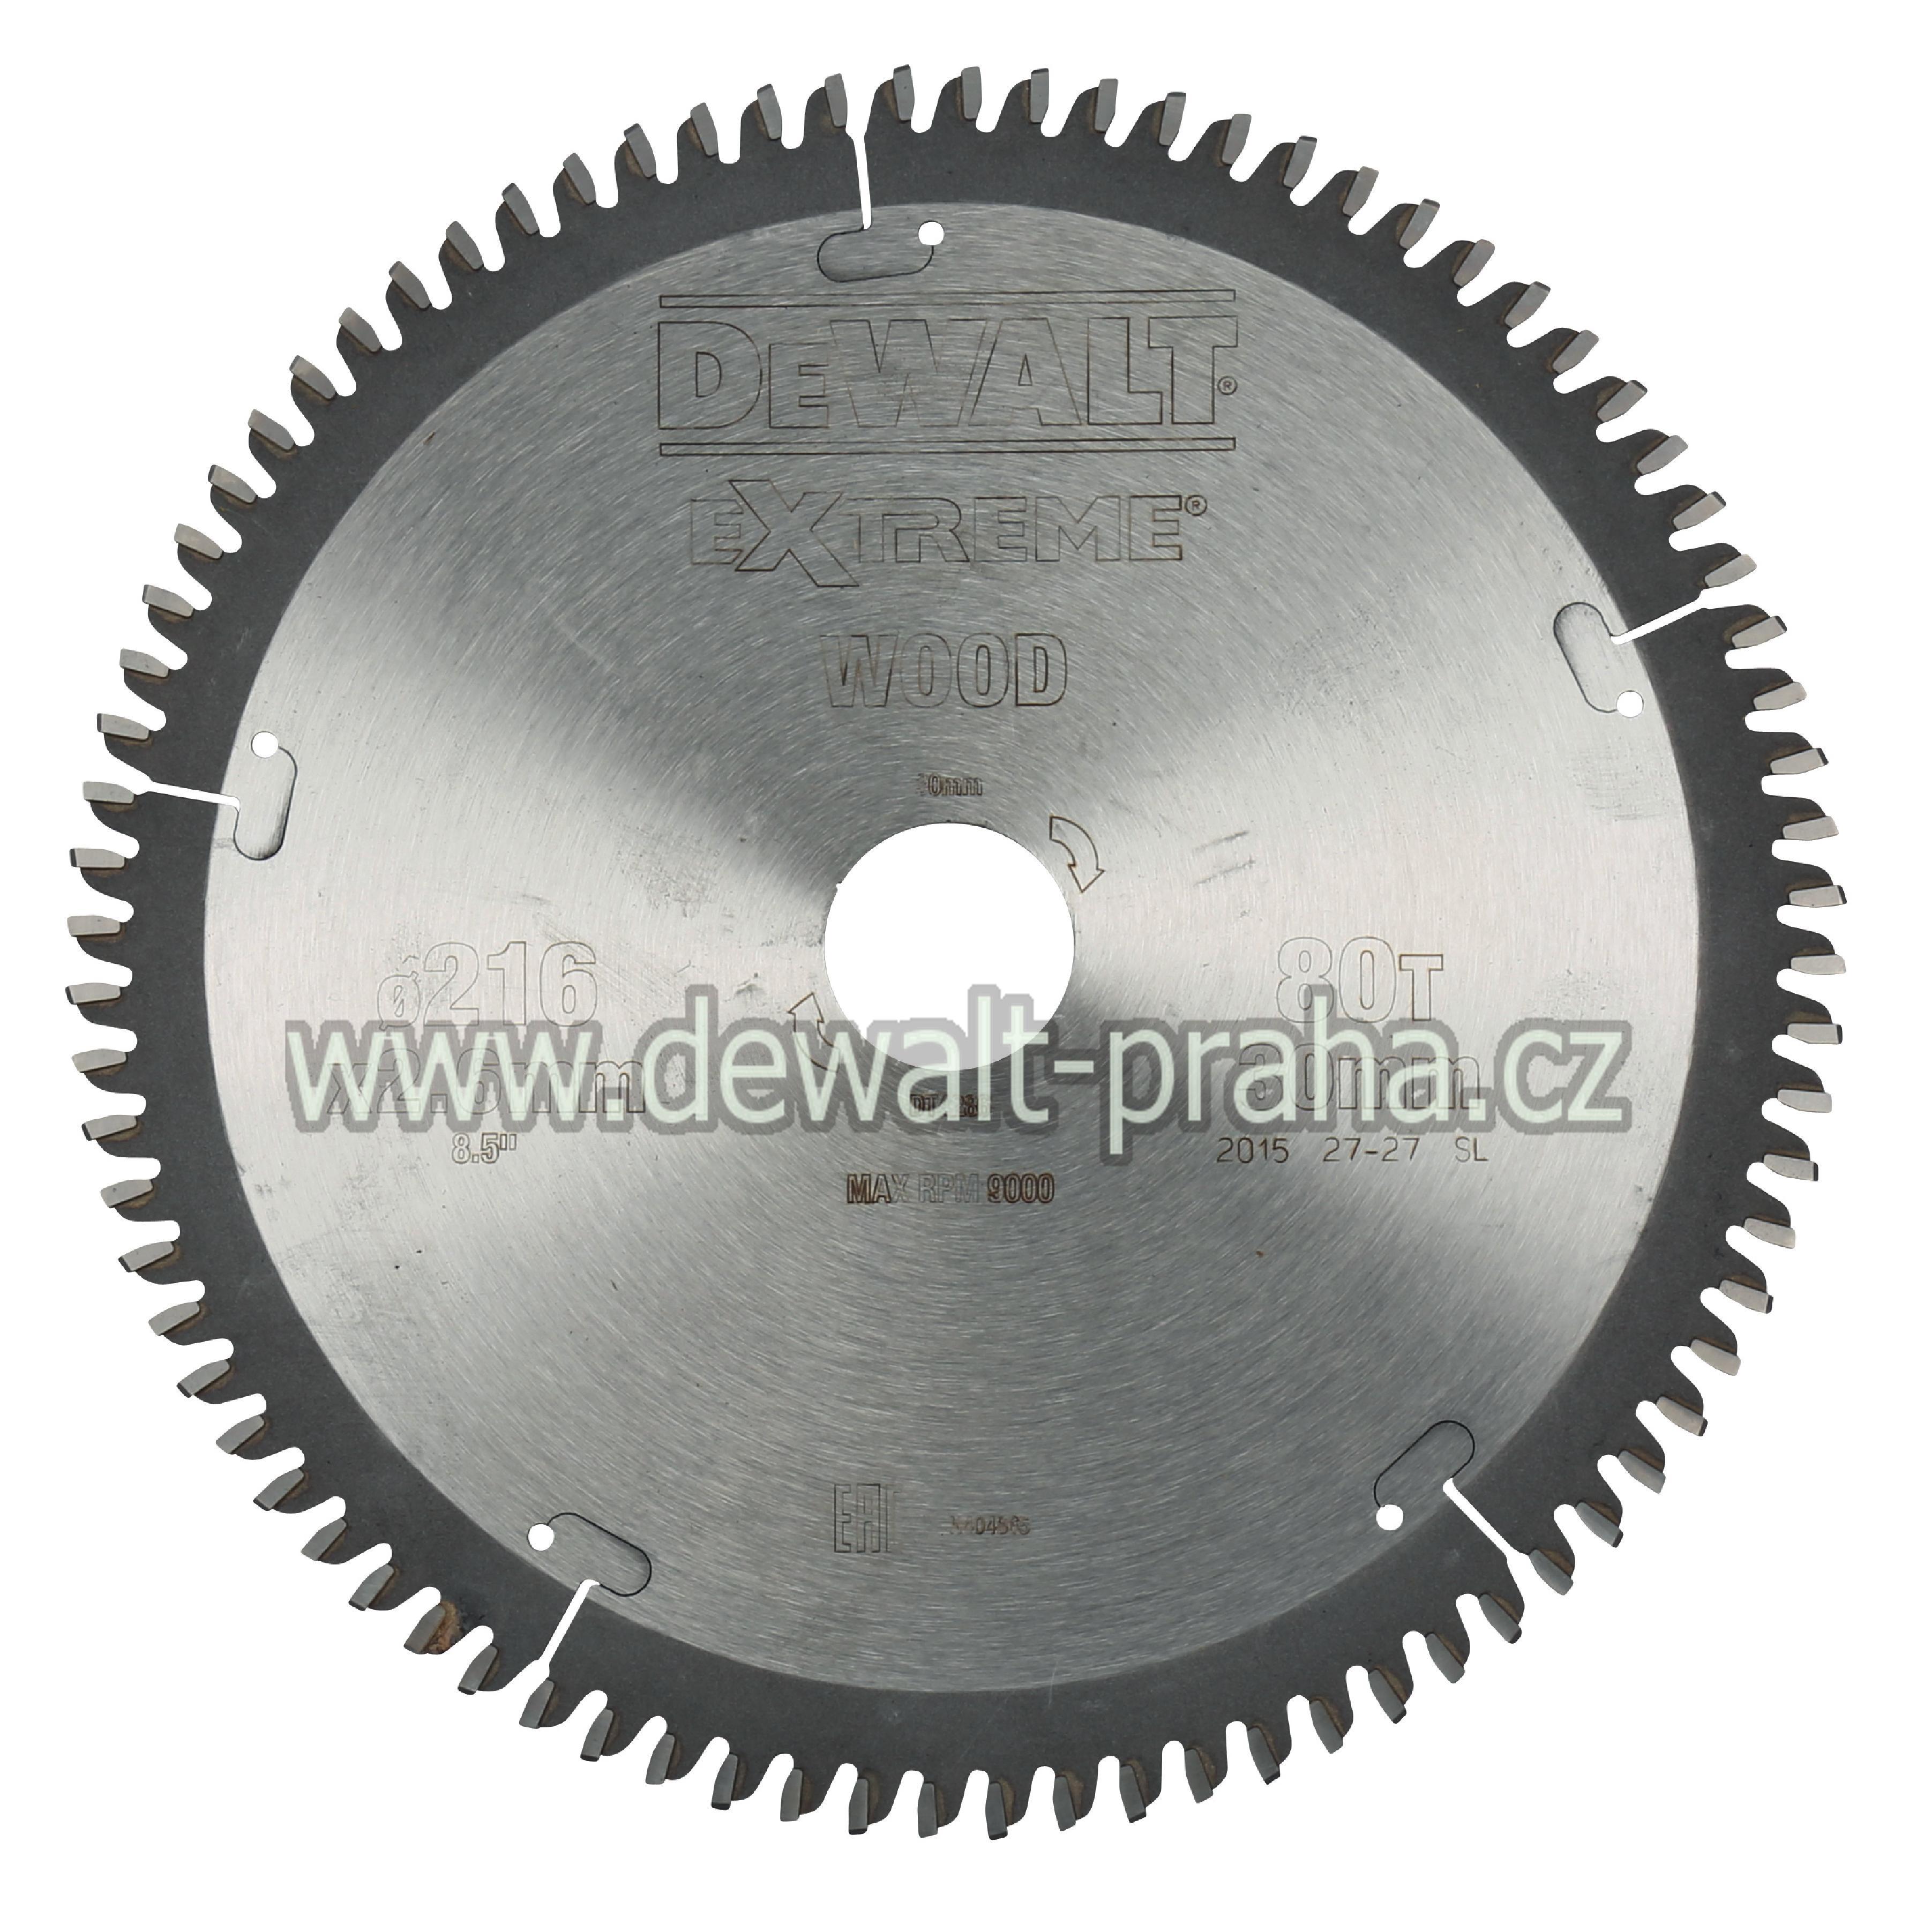 DT4286 DeWALT Pilový kotouč 216 x 30 mm, 80 zubů